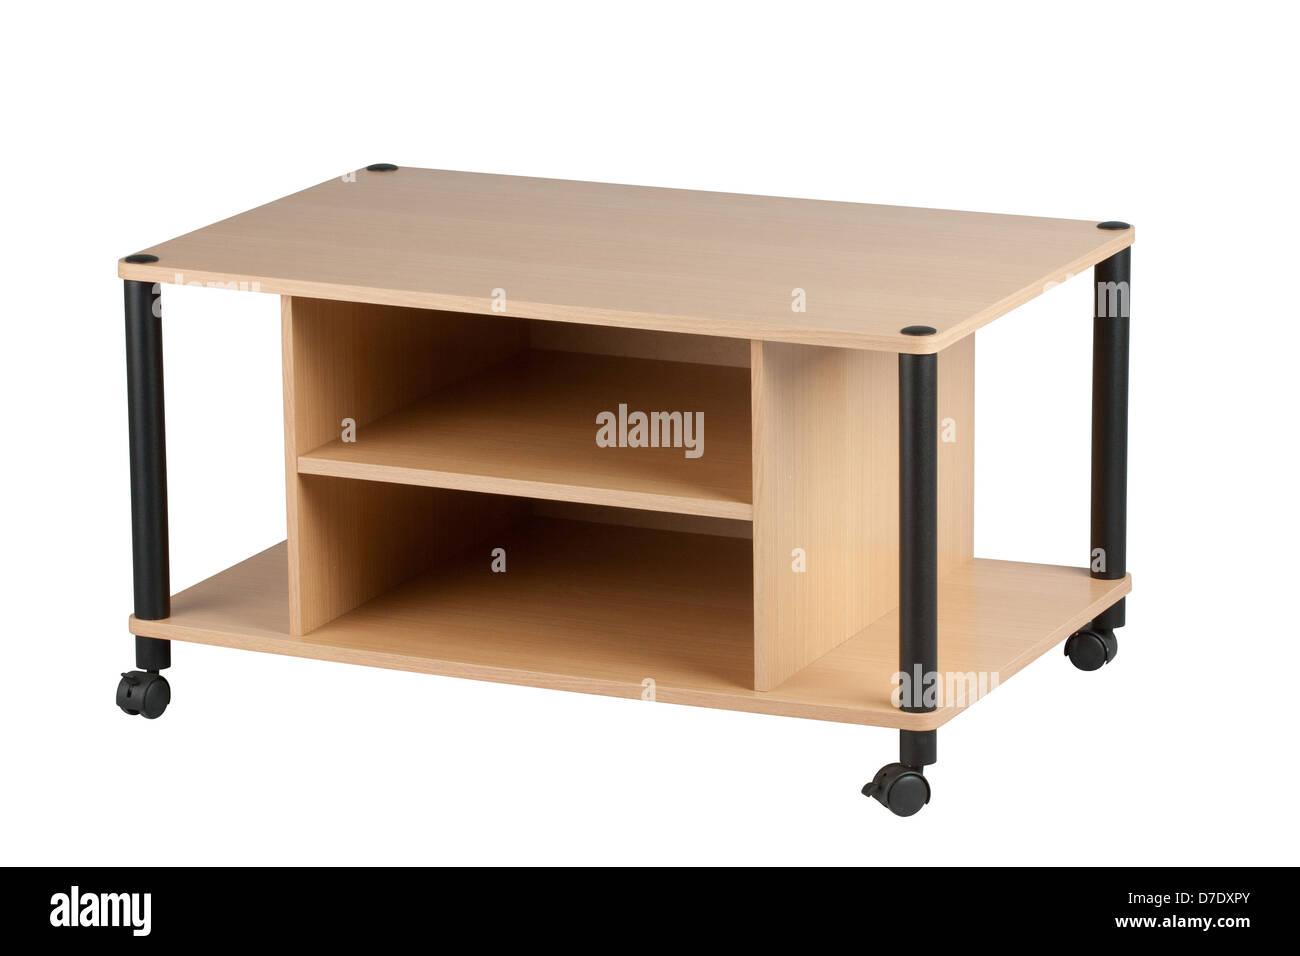 Tv Möbel Aus Holz Mit Rädern Stockfoto Bild 56240099 Alamy